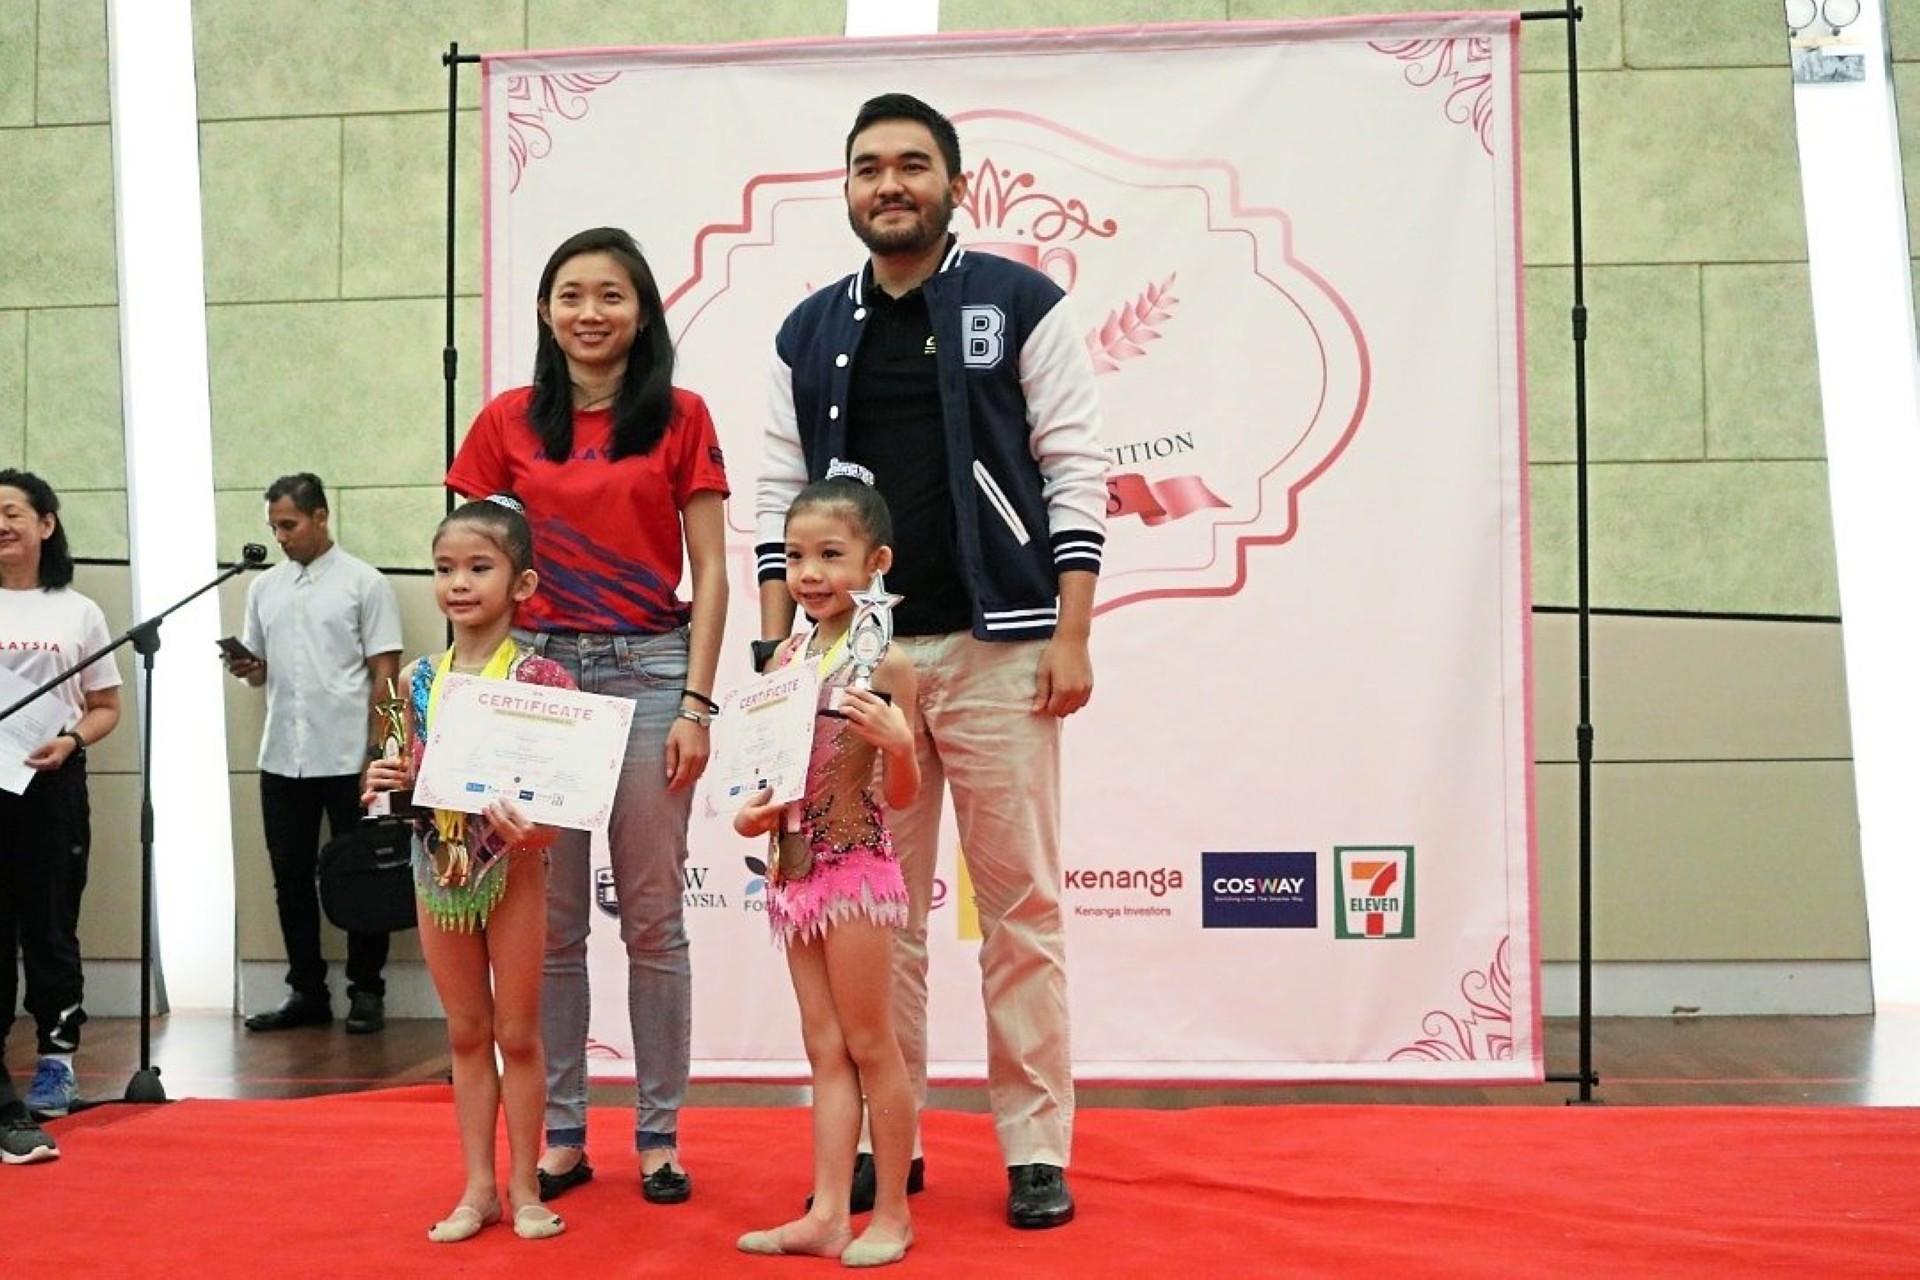 Lau and Tengku Amir with two participants at the Princess Rhythmic Gymnastics Championship.